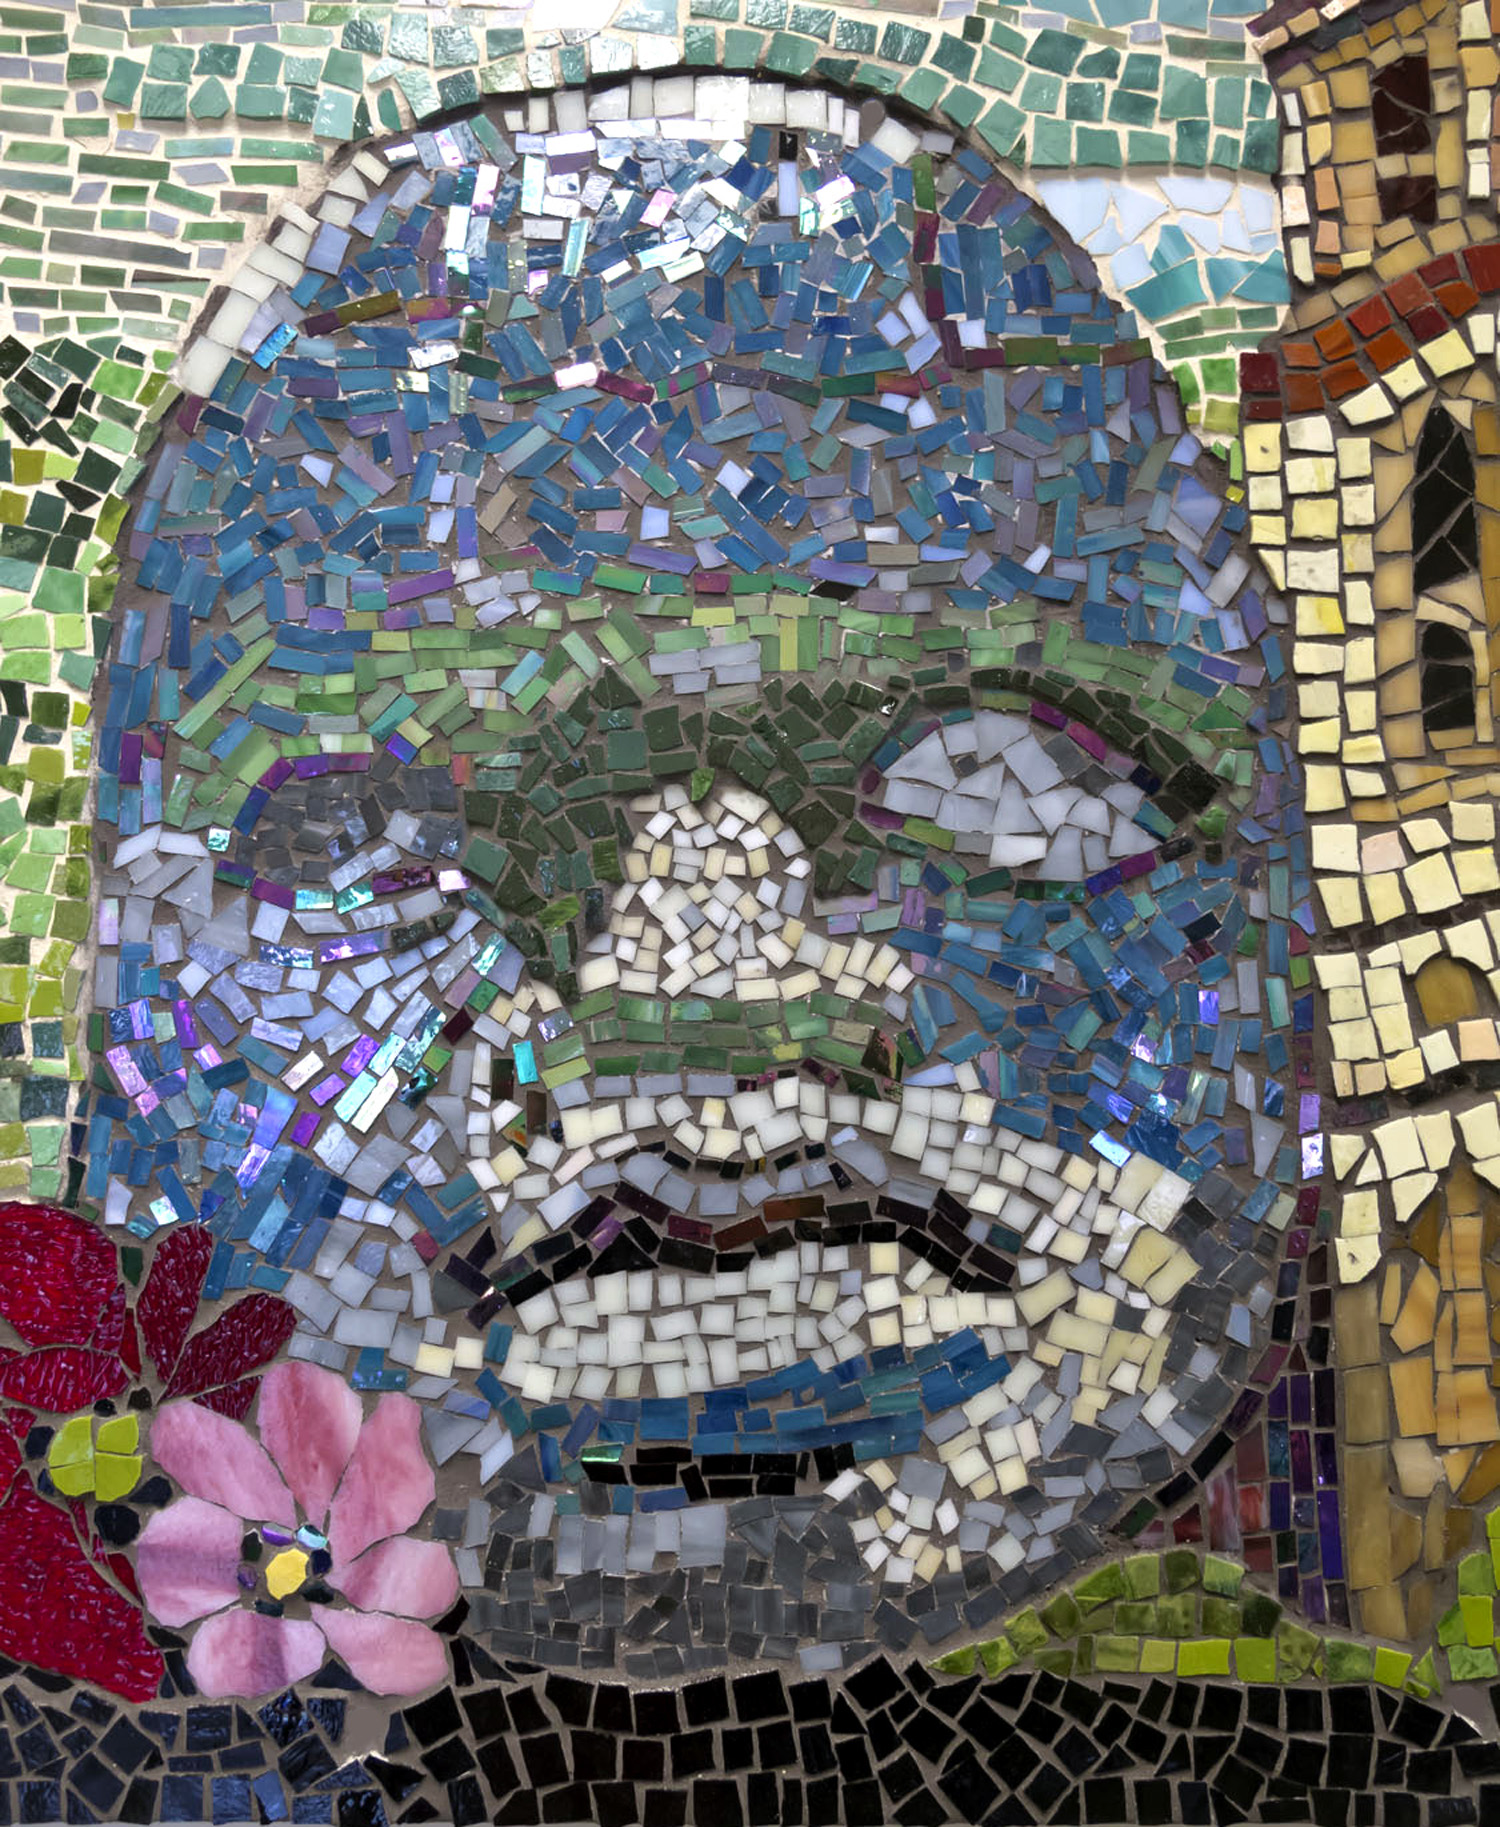 04_JWB_BSI_mosaic_detail2.jpg